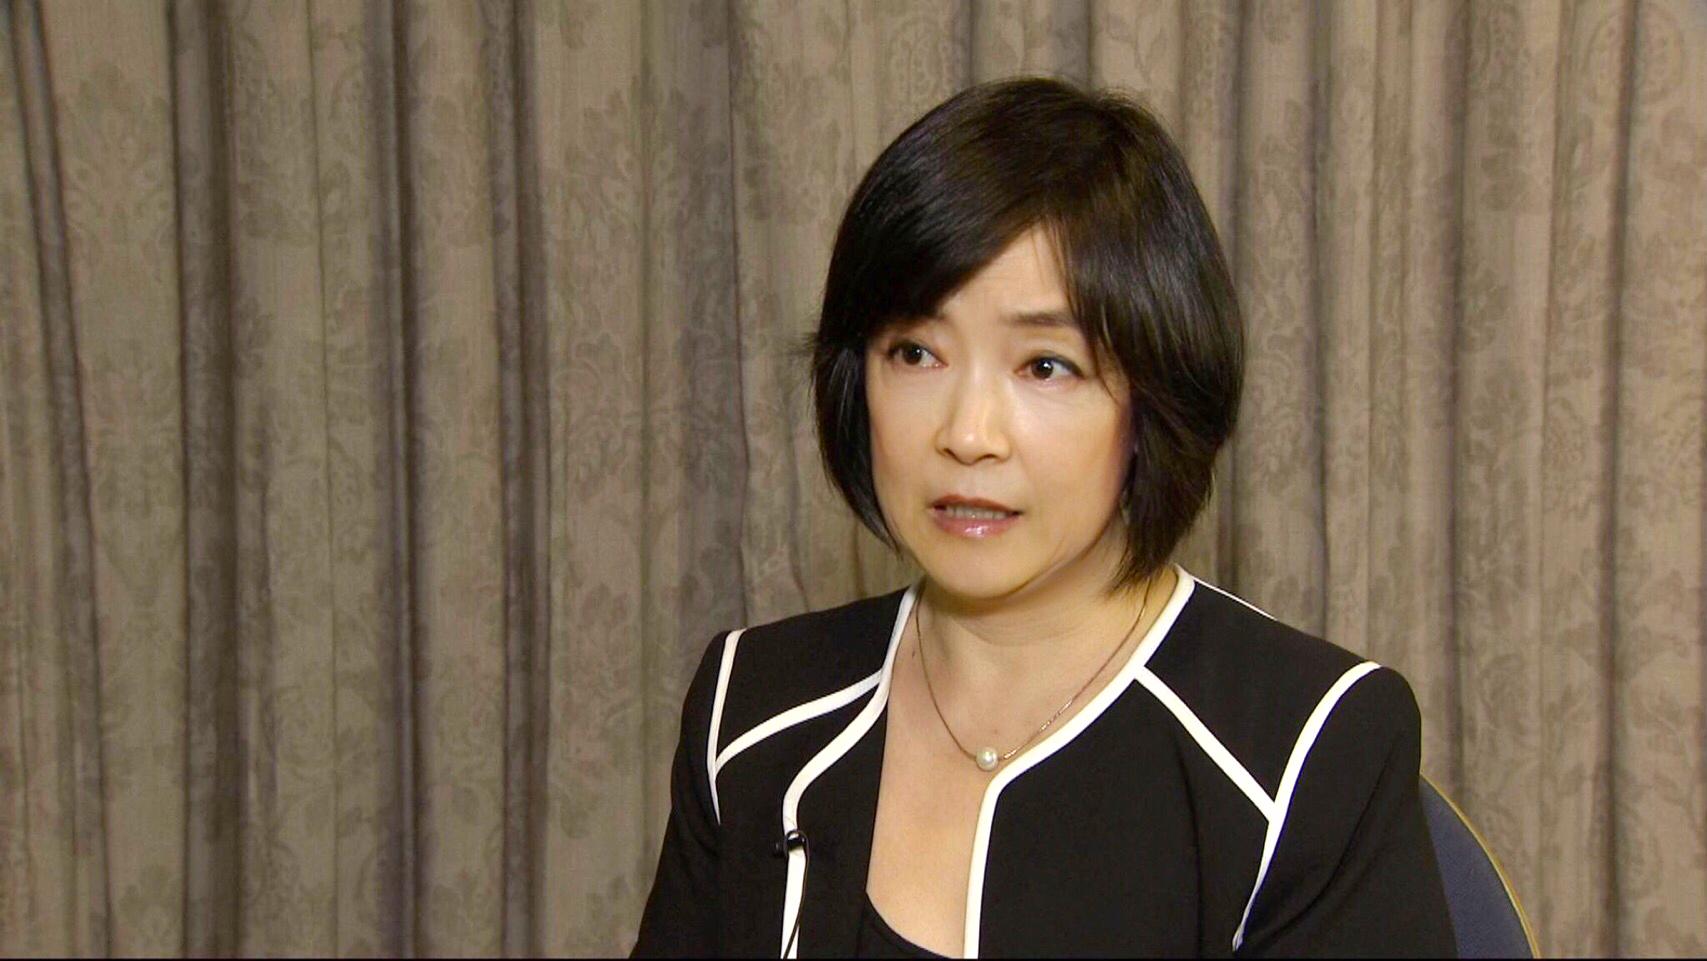 Jennifer Zeng was arrested for following Falun Gong